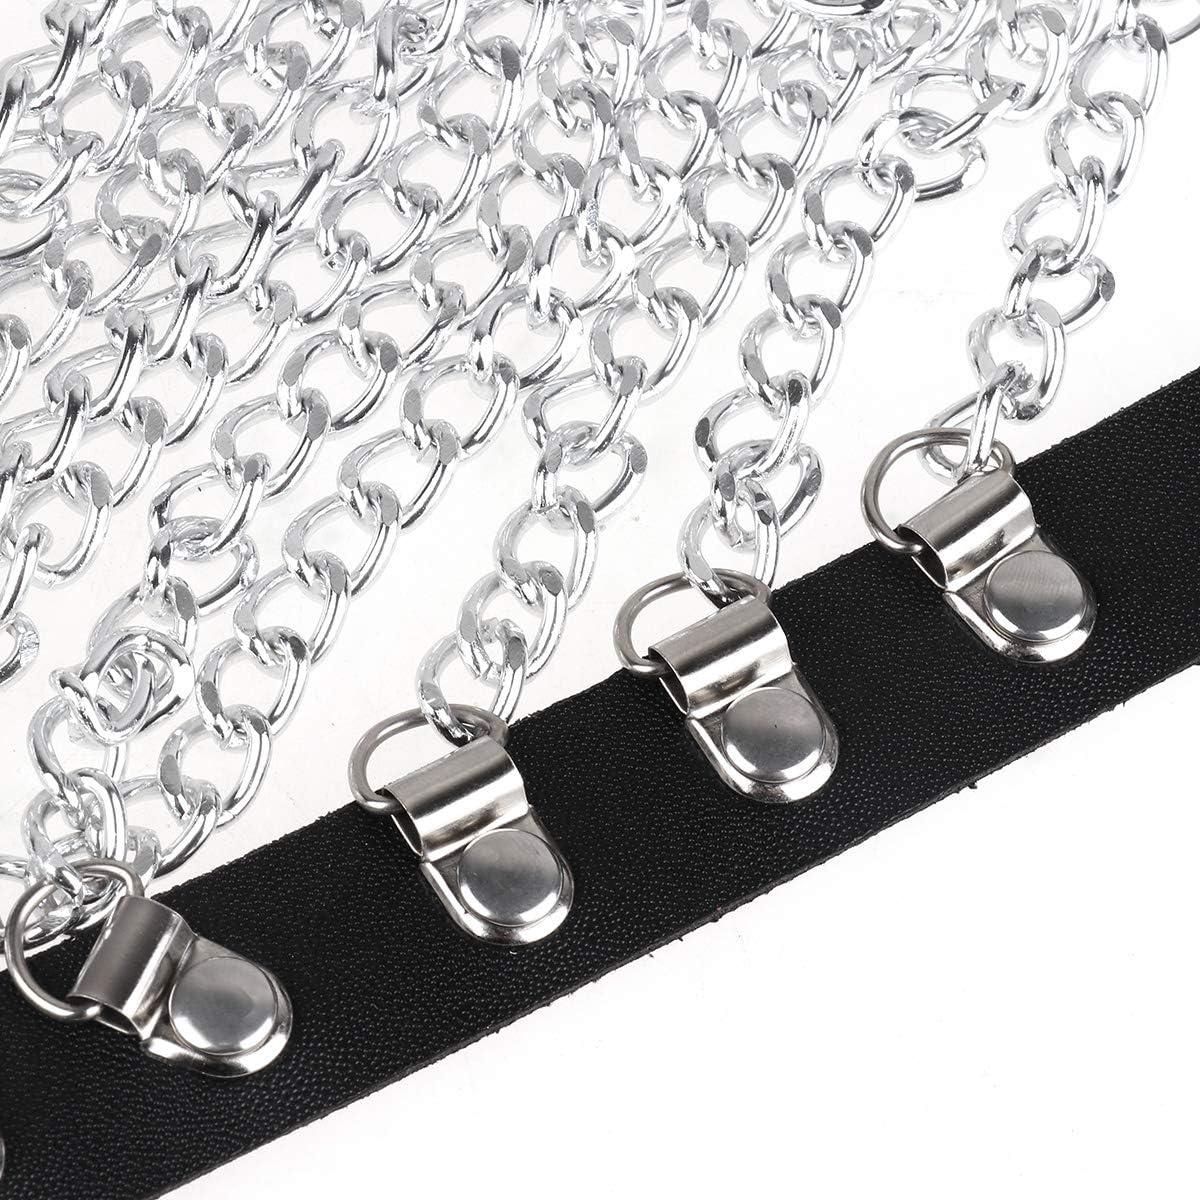 Details about  /Mini Size Lozenge Punk Metal Chain Bags for Women Metal Button Fashionable